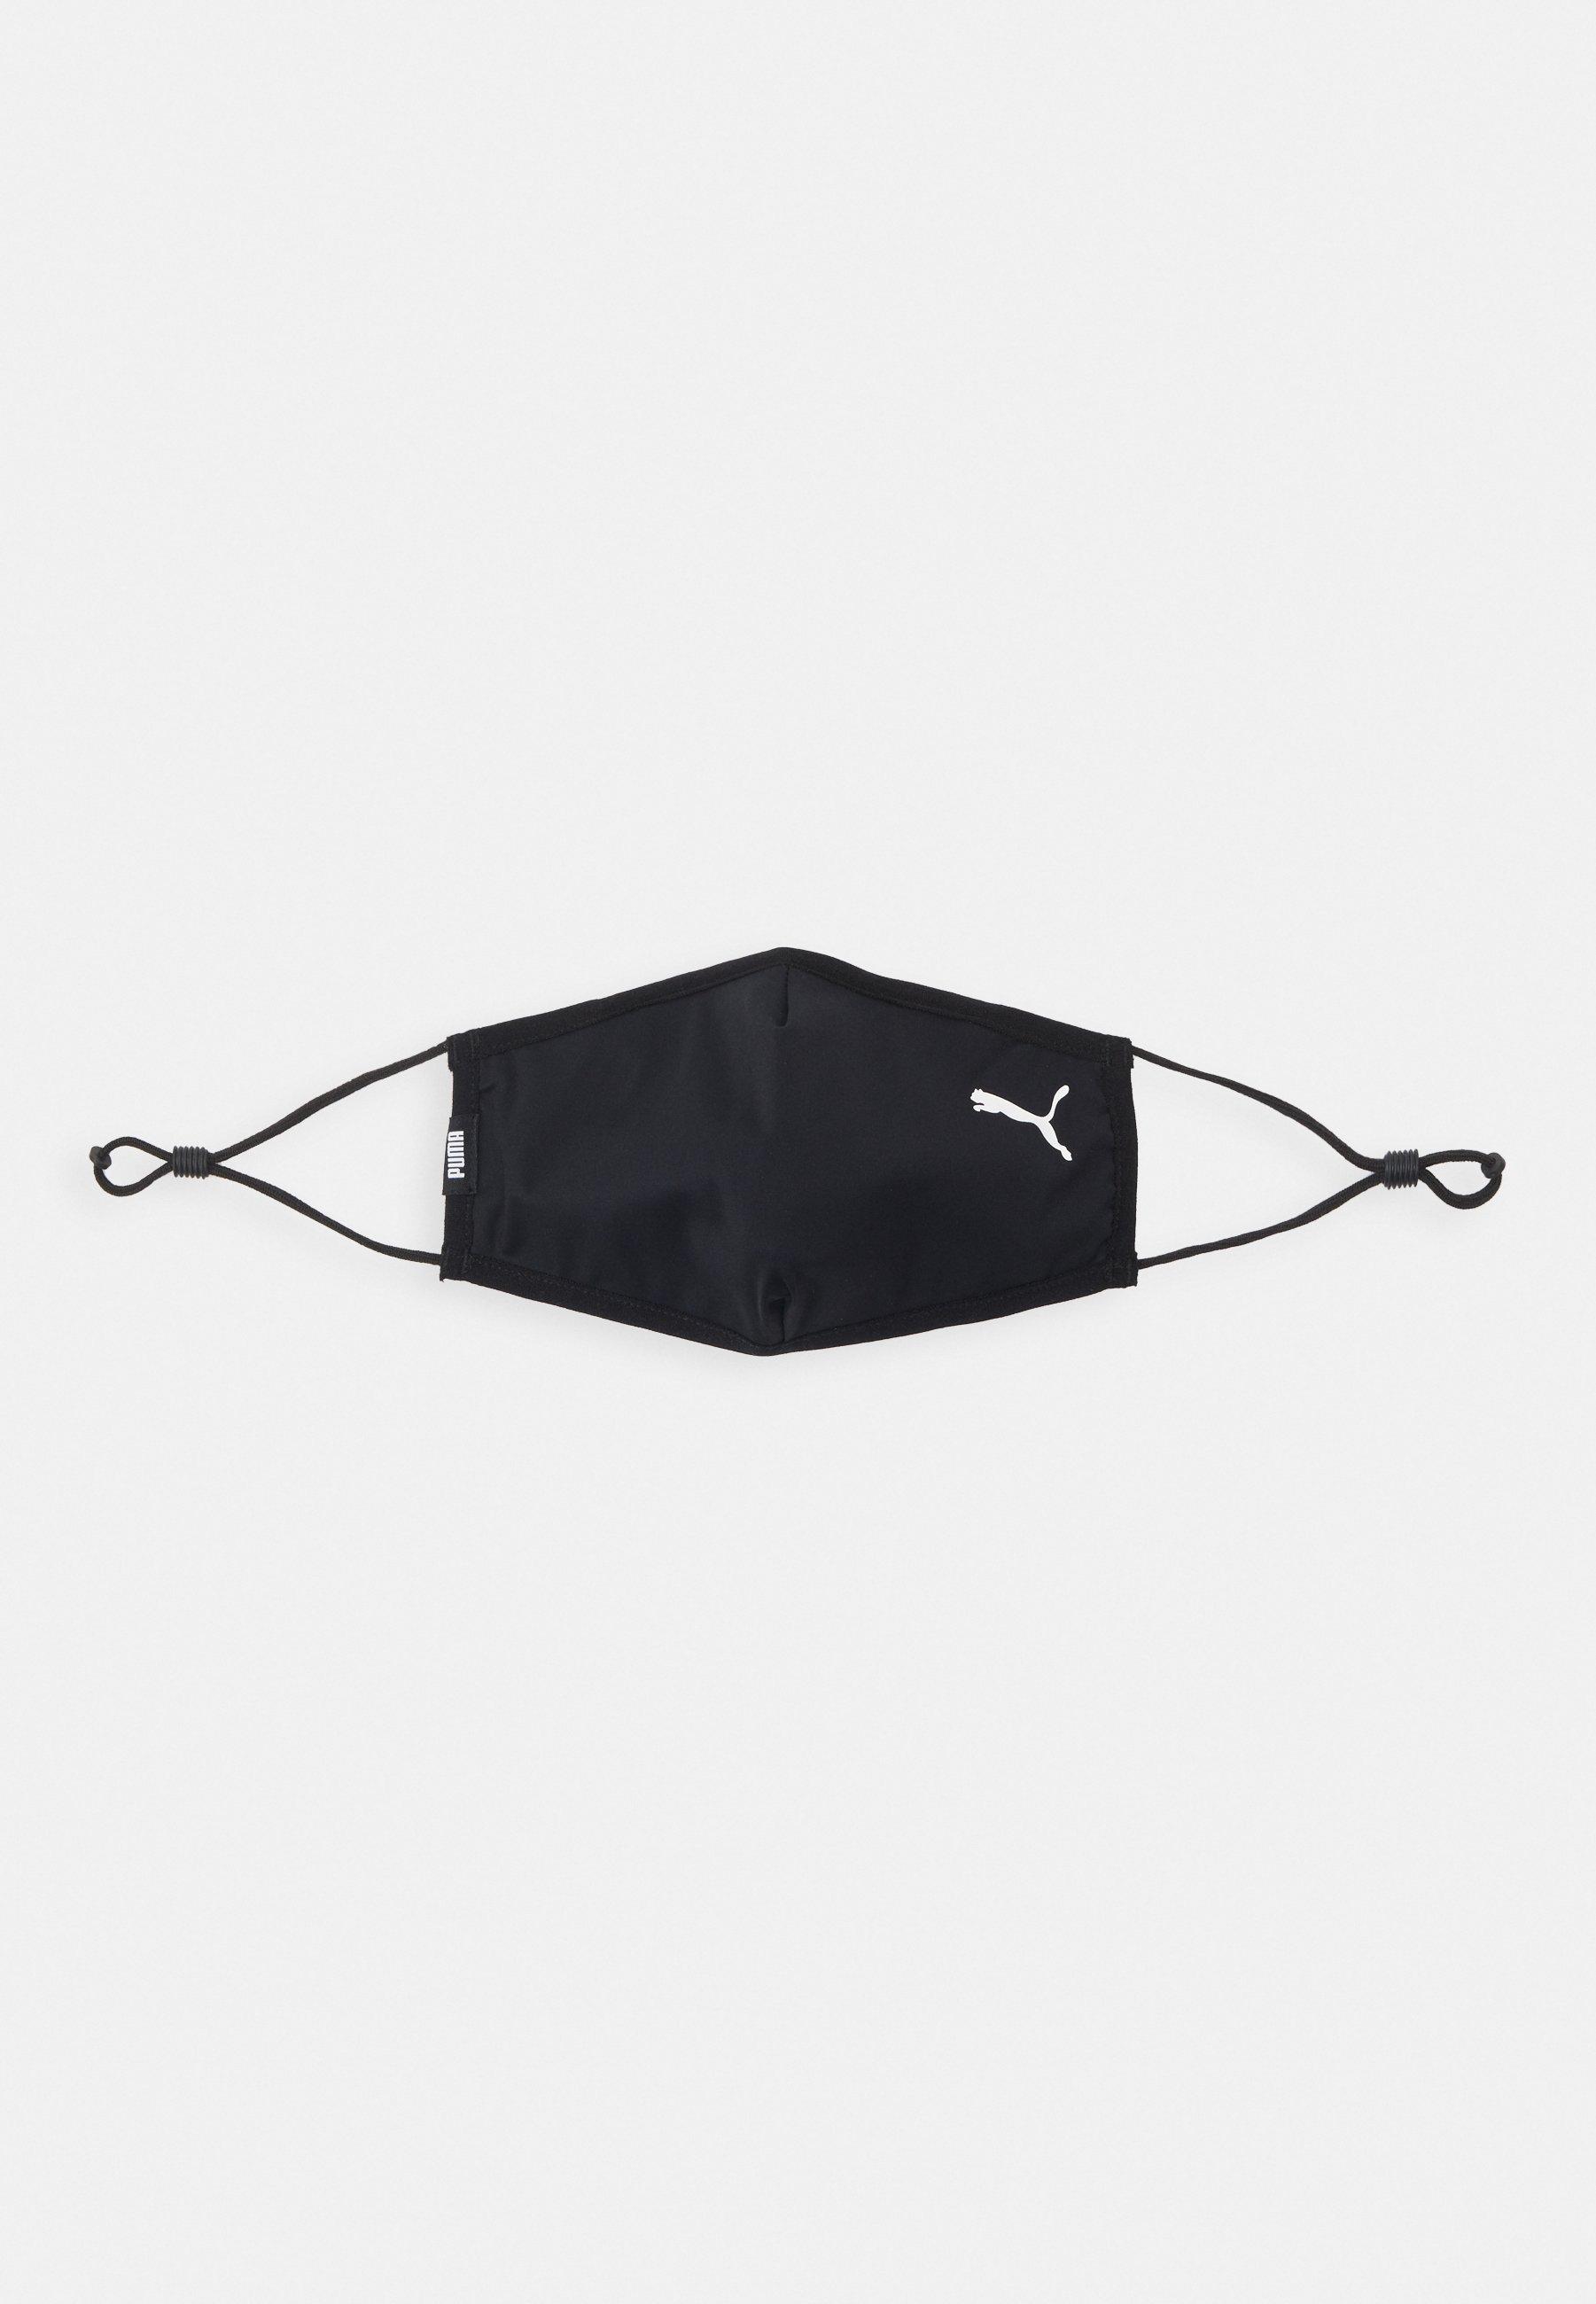 Puma FACE MASK 2 PACK UNISEX - Masque en tissu - black/noir ...